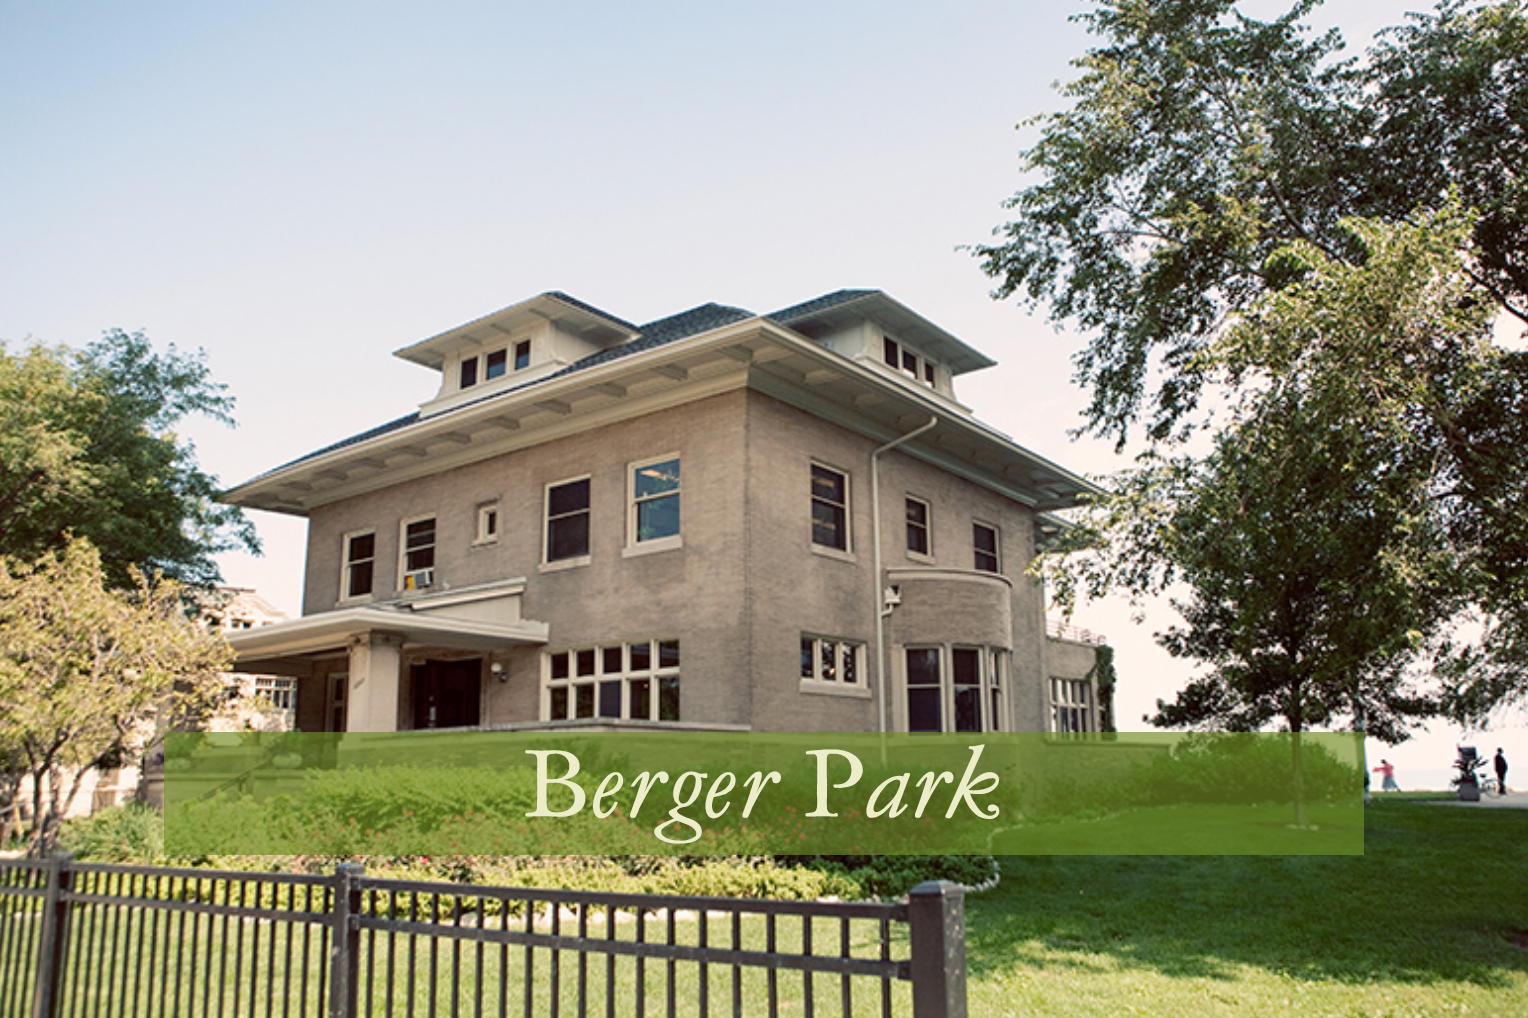 Berger Park.jpg